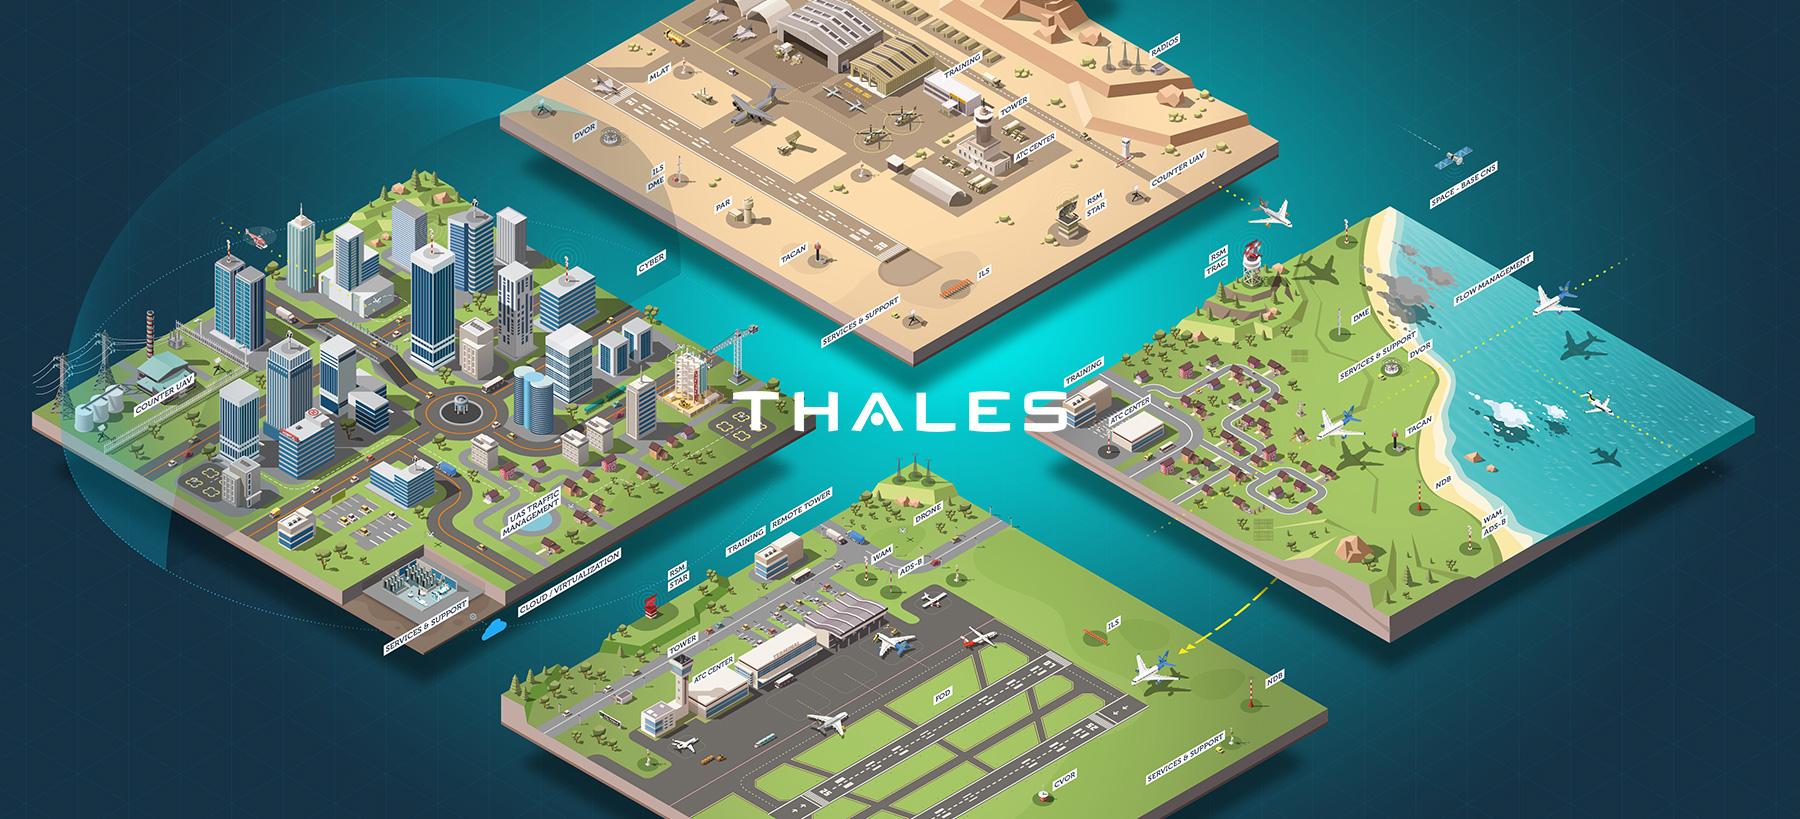 Directeur artistique freelance - THALES SYSTEMS - Illustrations